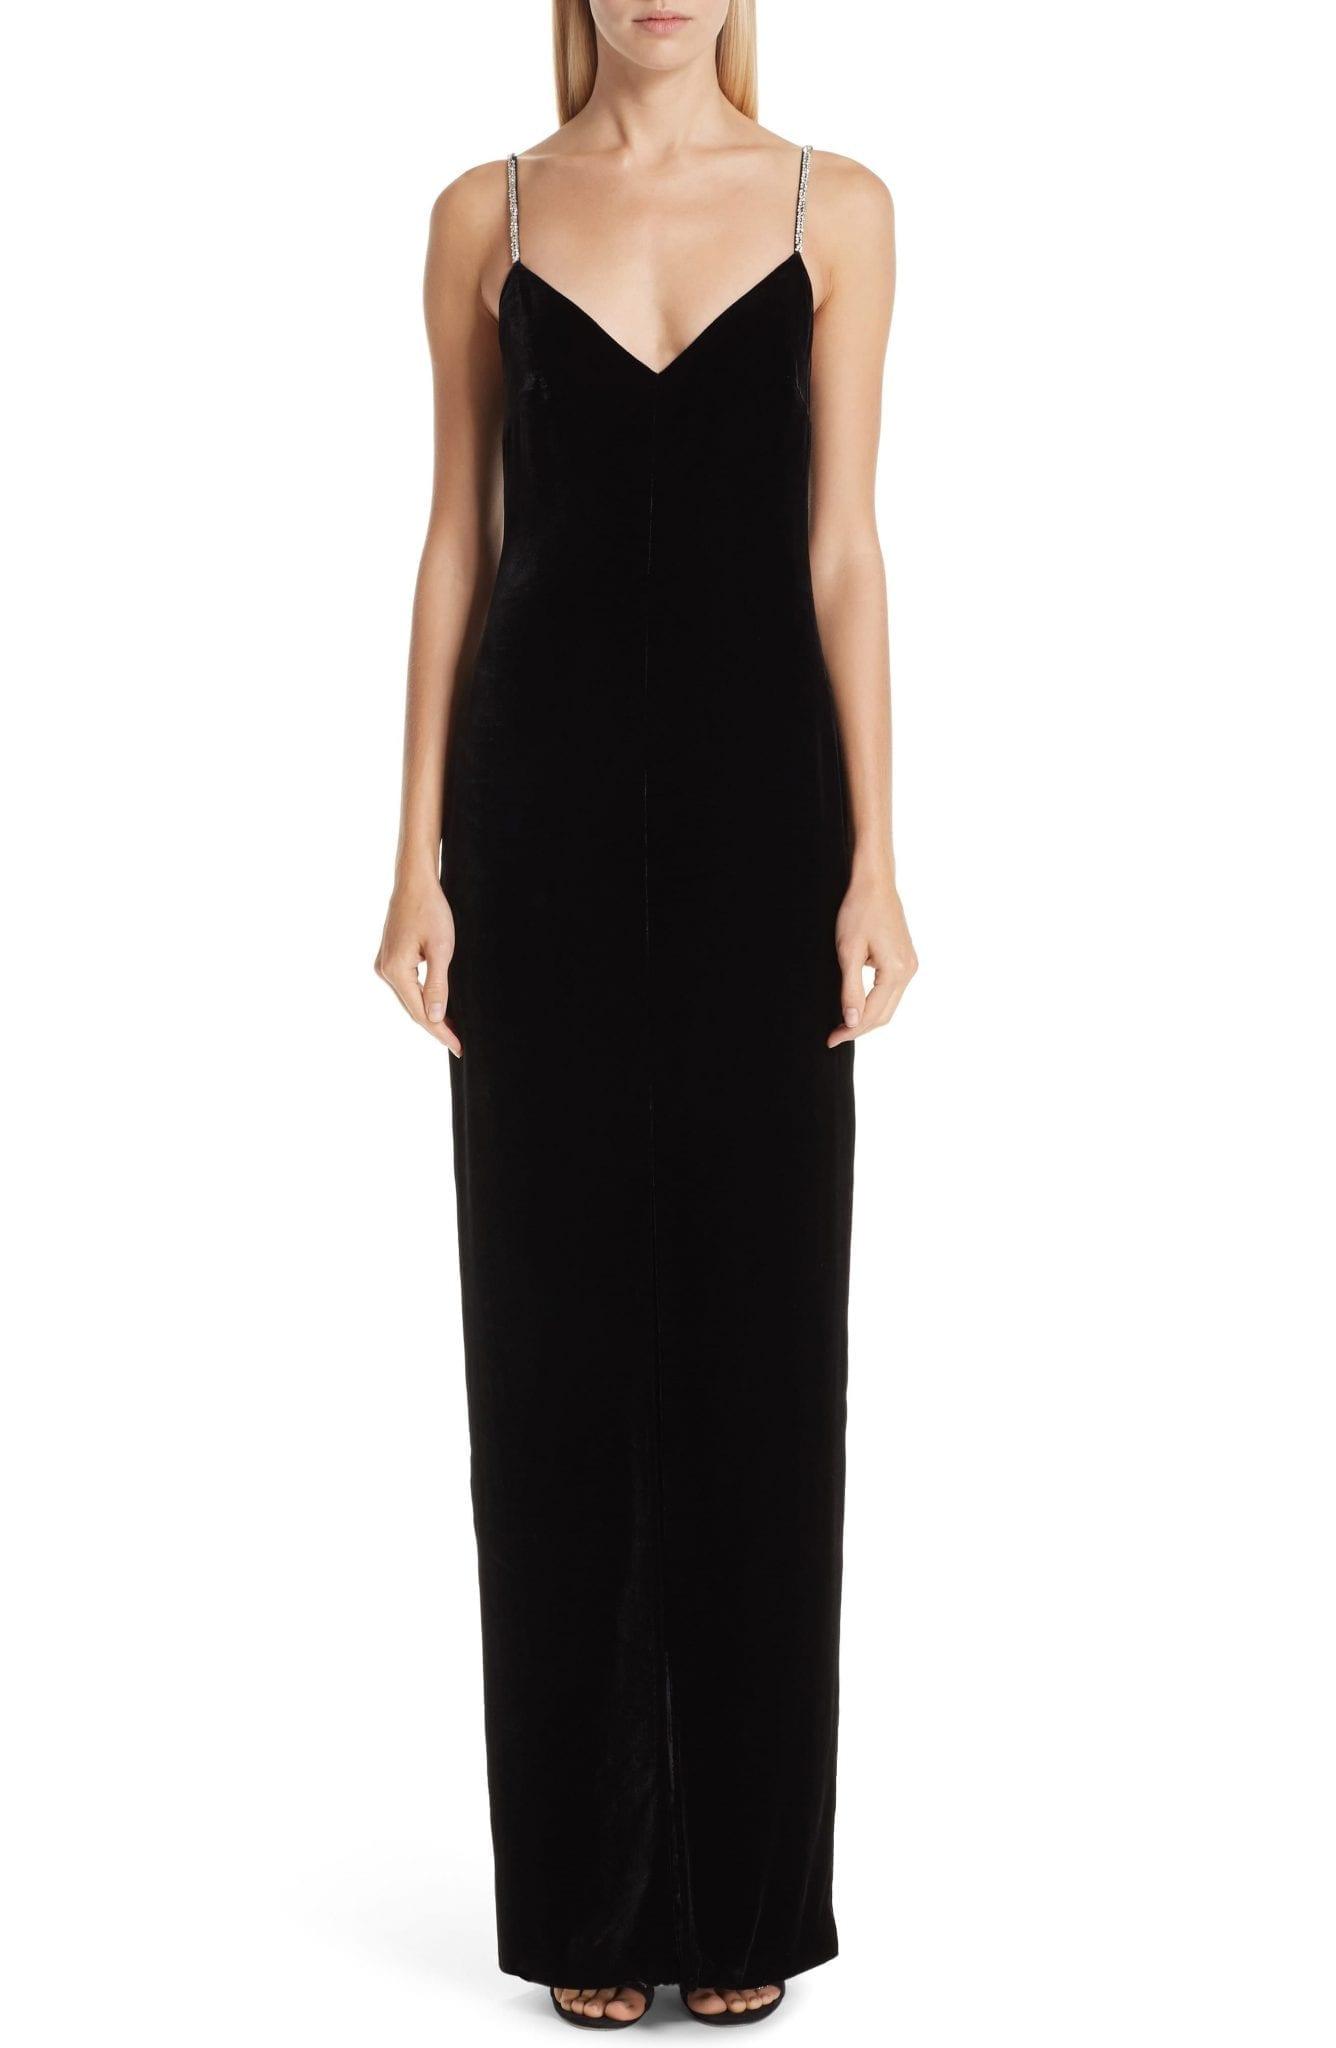 MONIQUE LHUILLIER Crystal Strap Velvet Column Black Gown